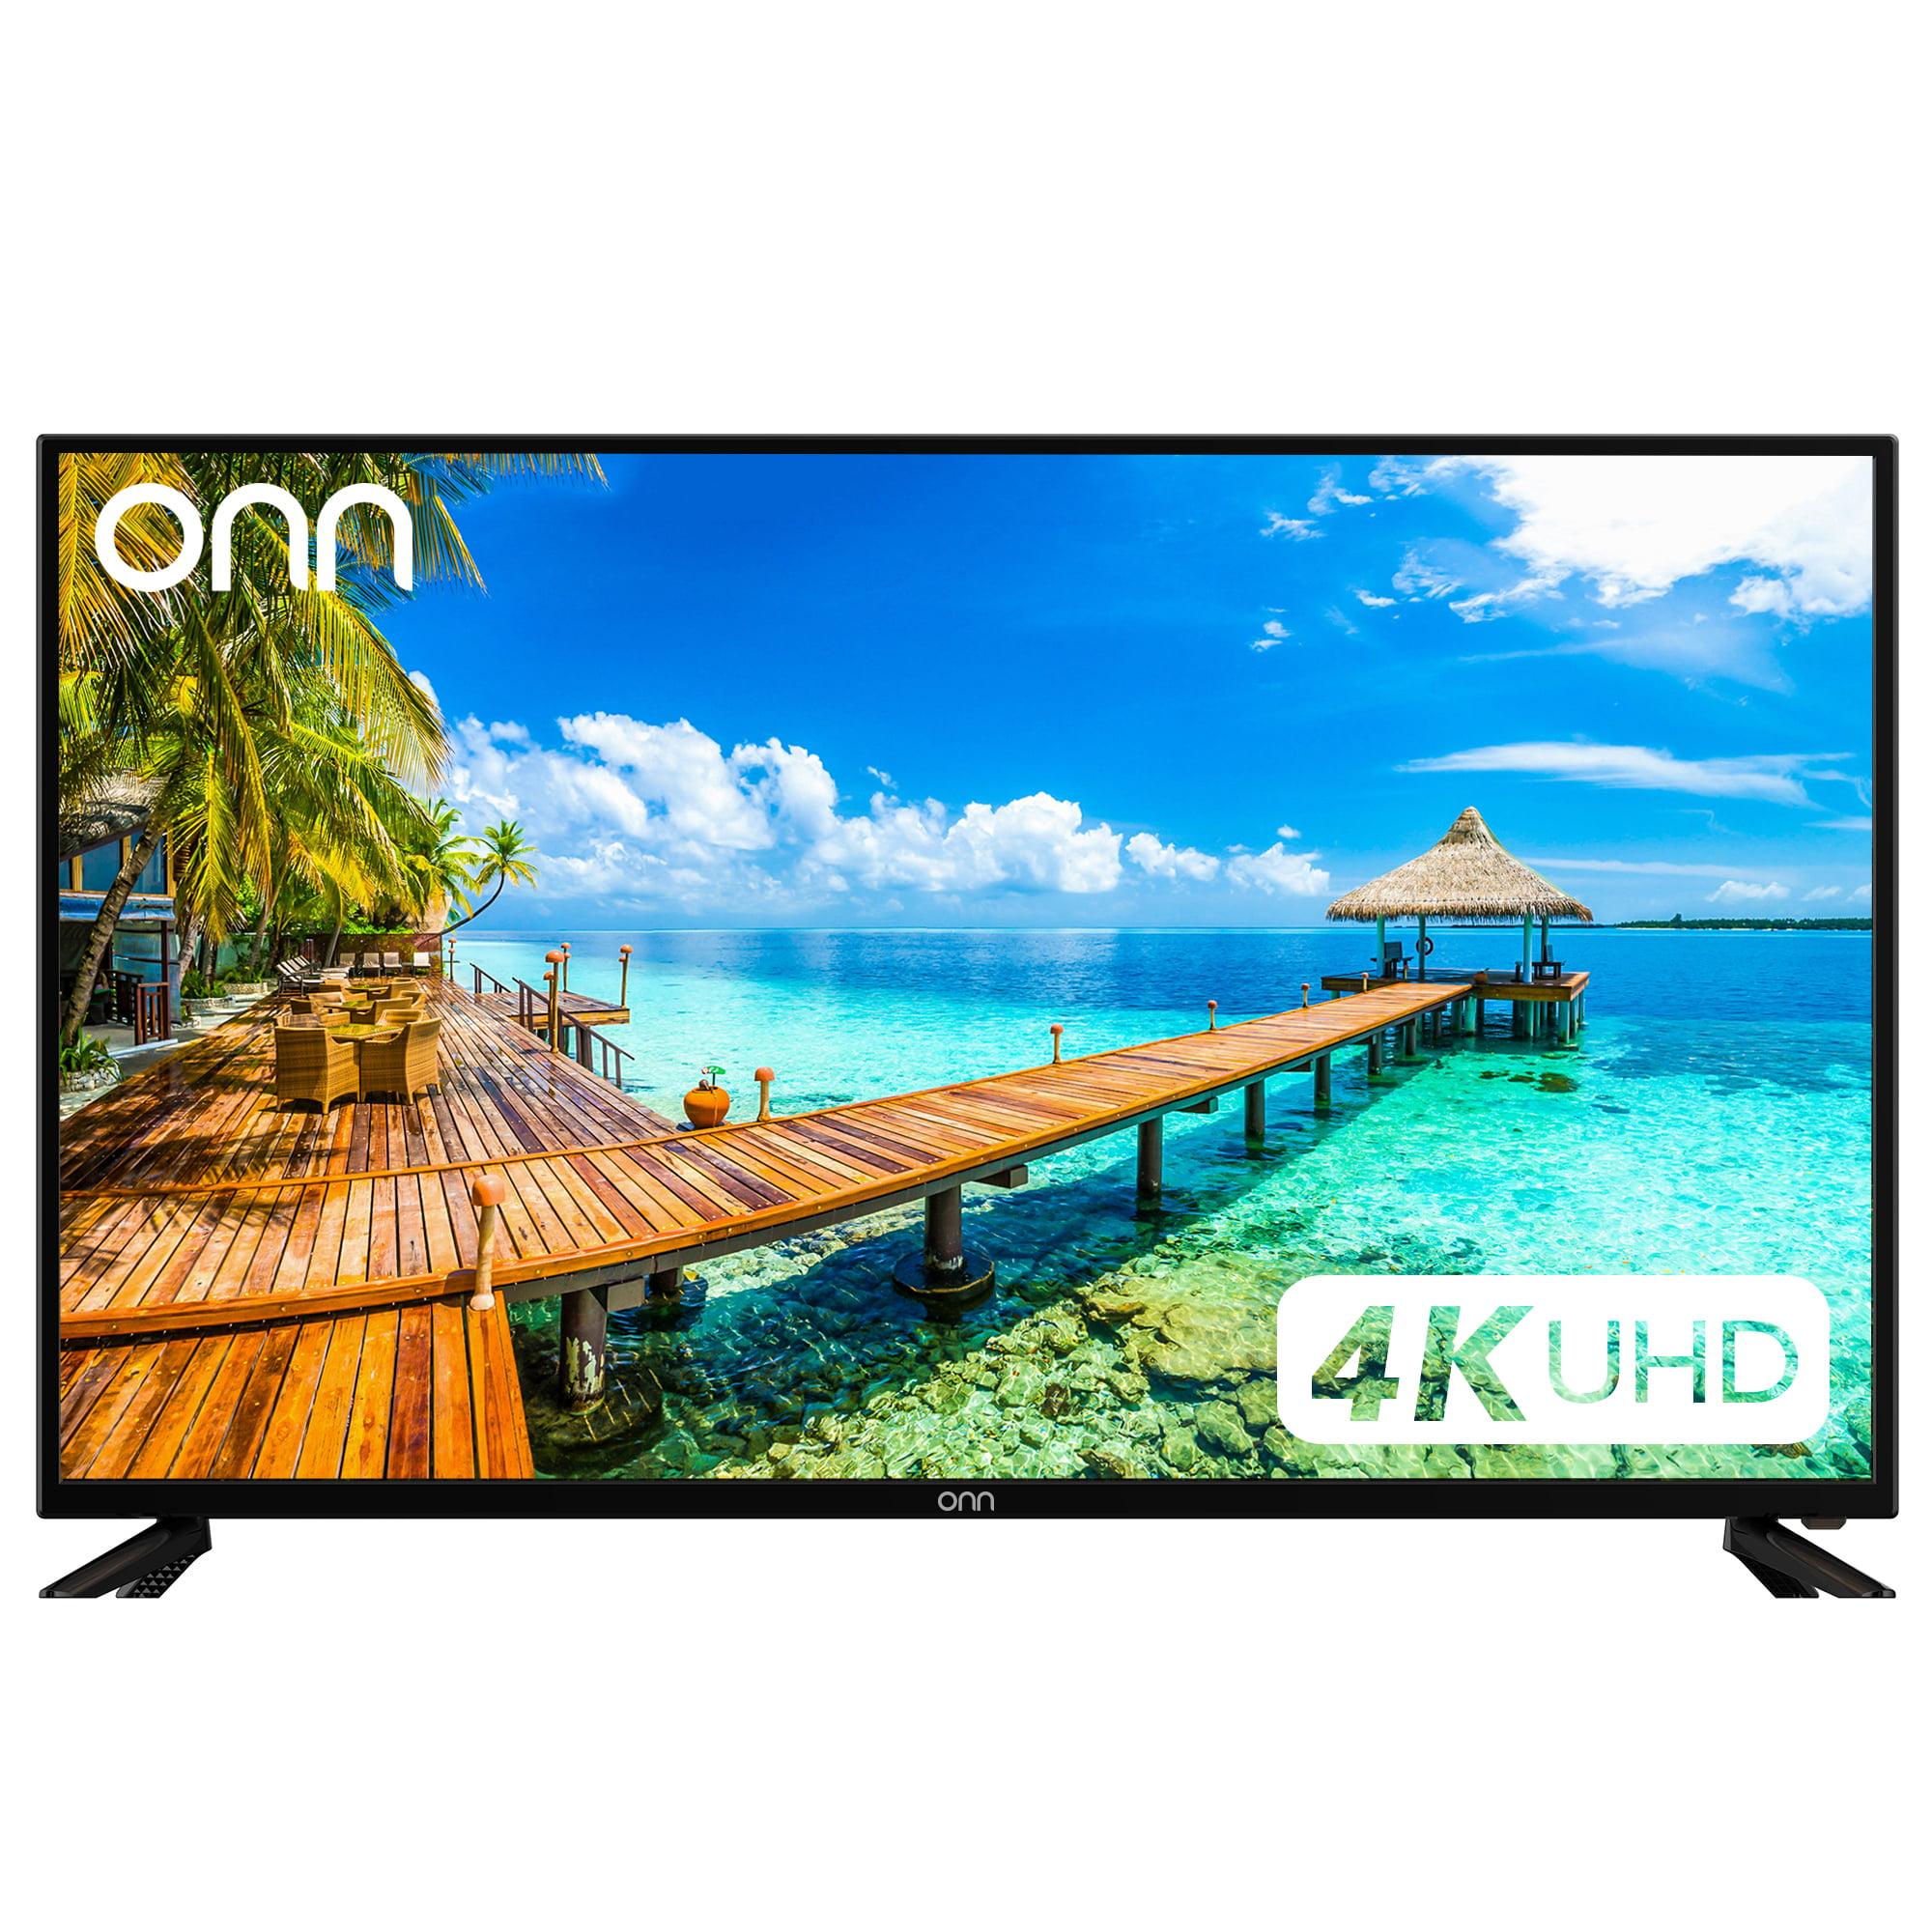 "onn. 50"" Class 4K UHD LED TV ONA50UB19E05"